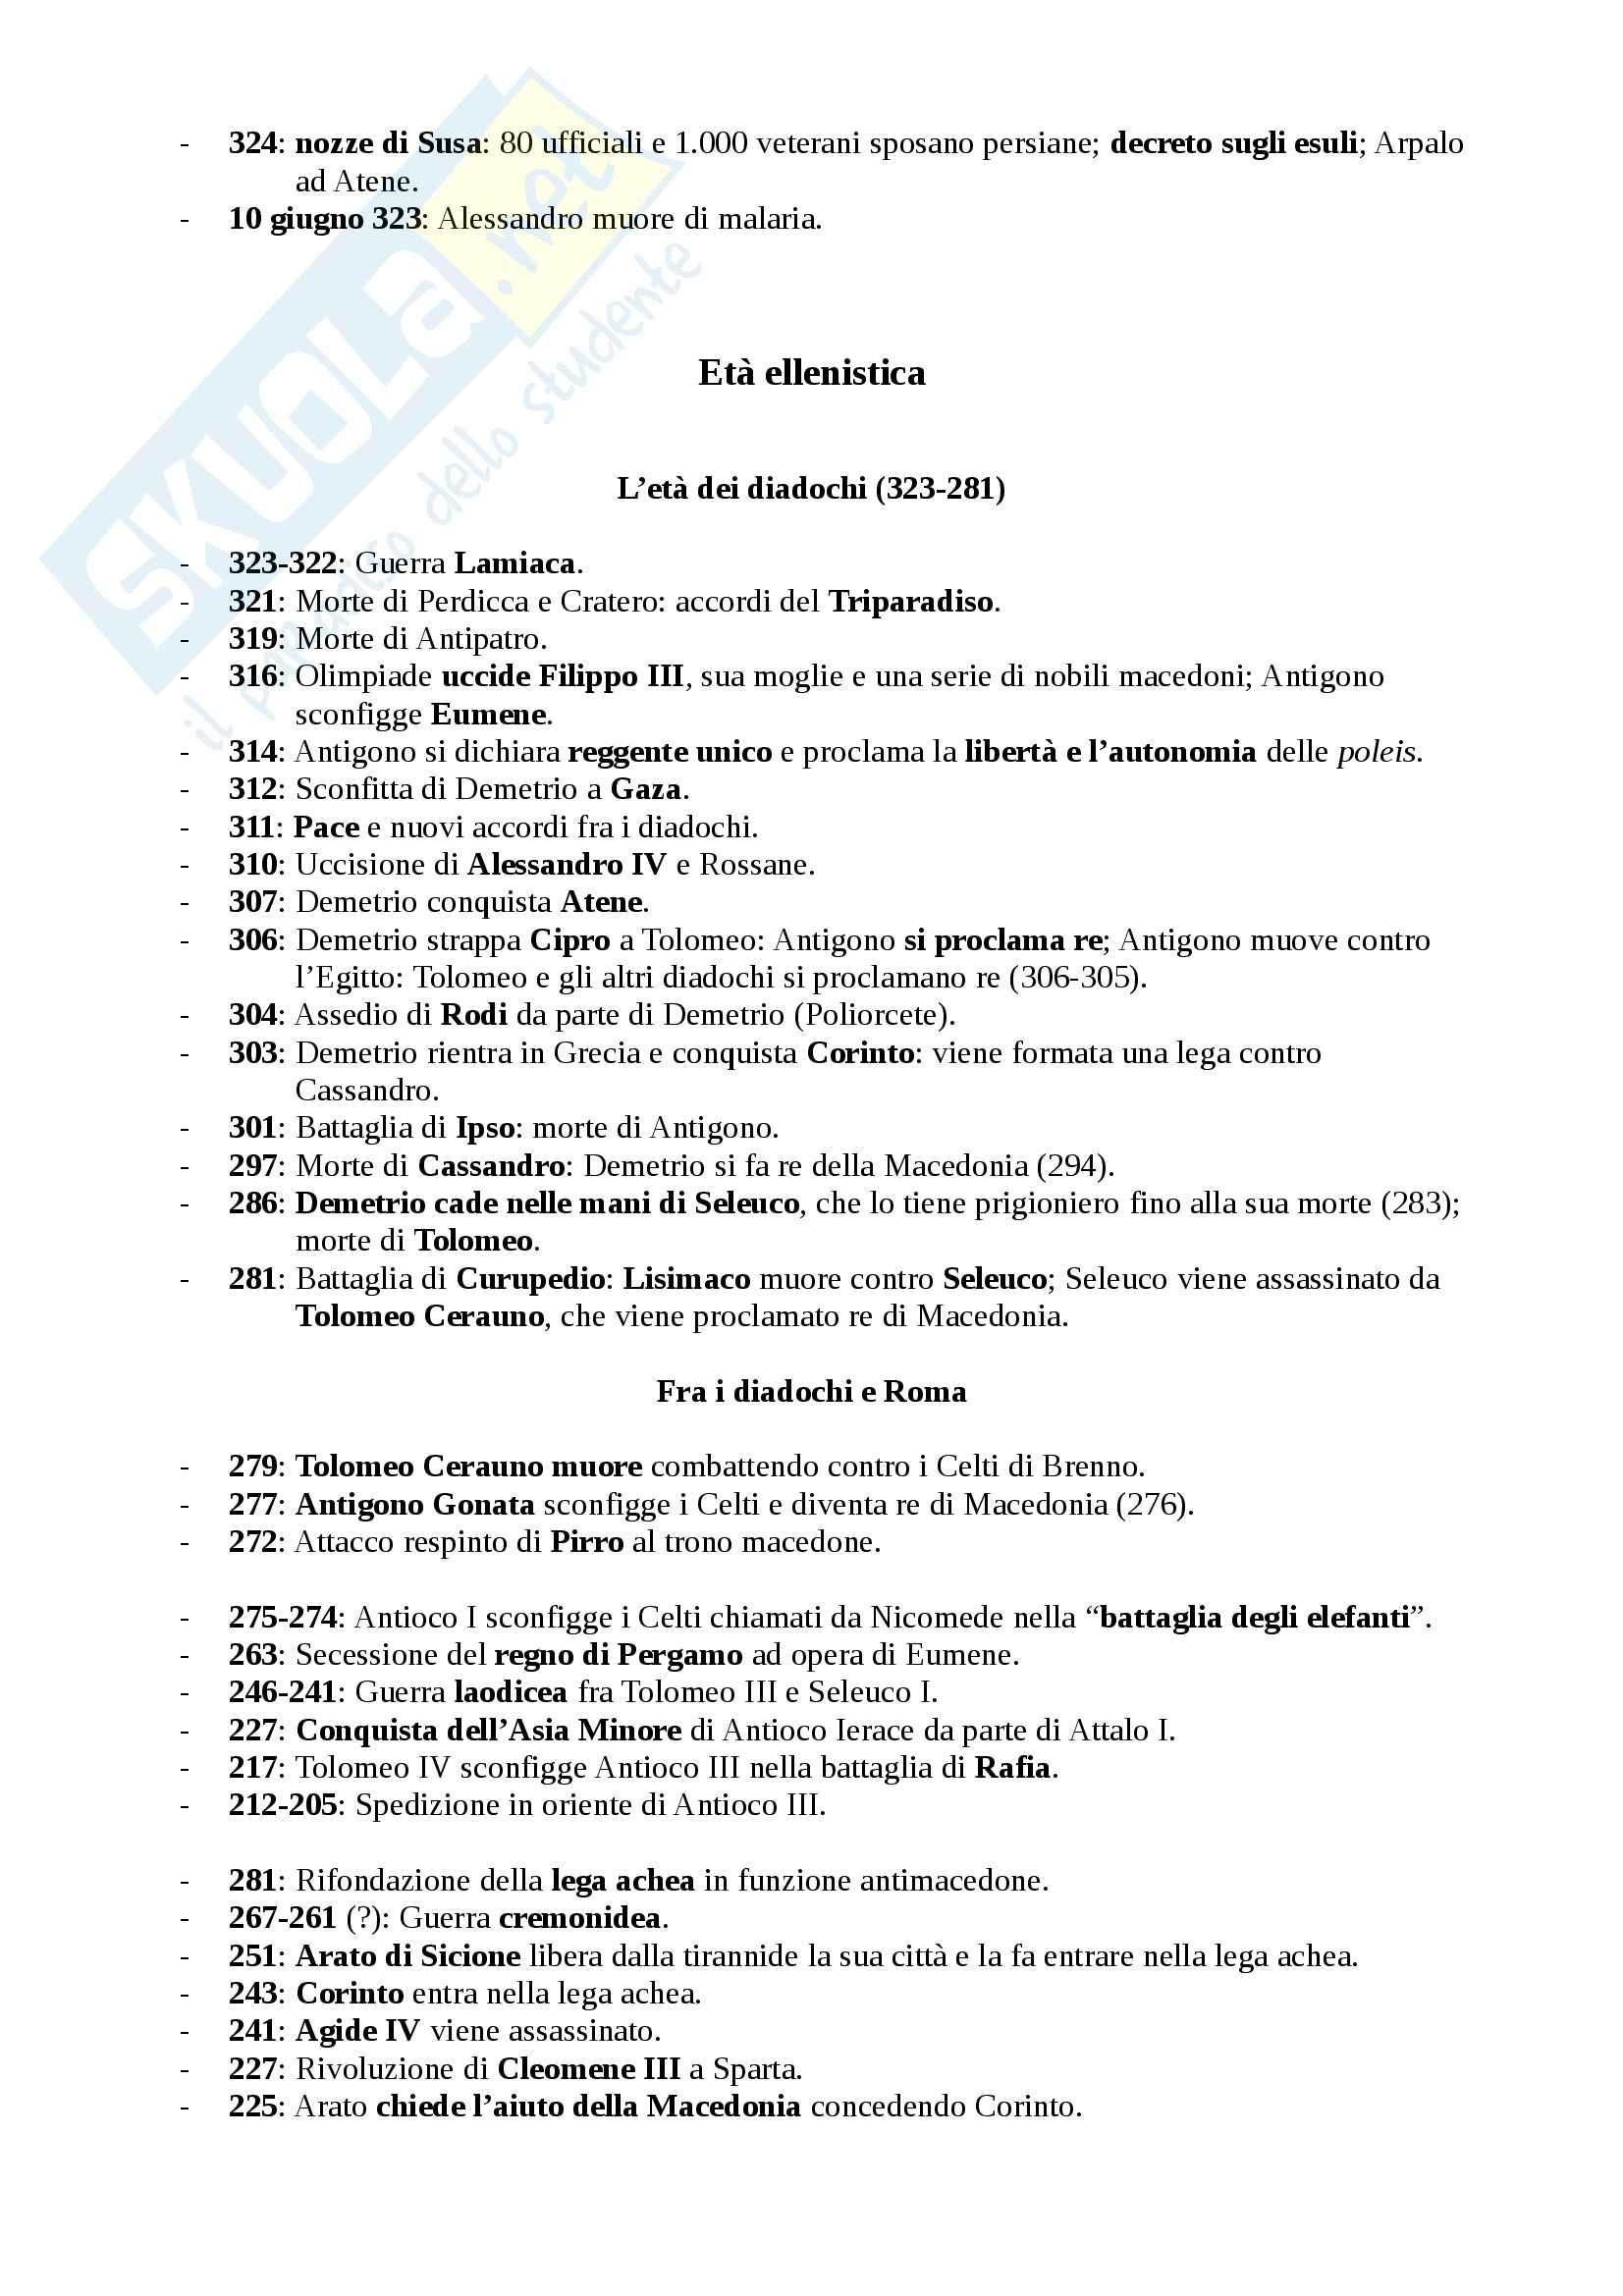 Storia greca - Cronologia Pag. 6